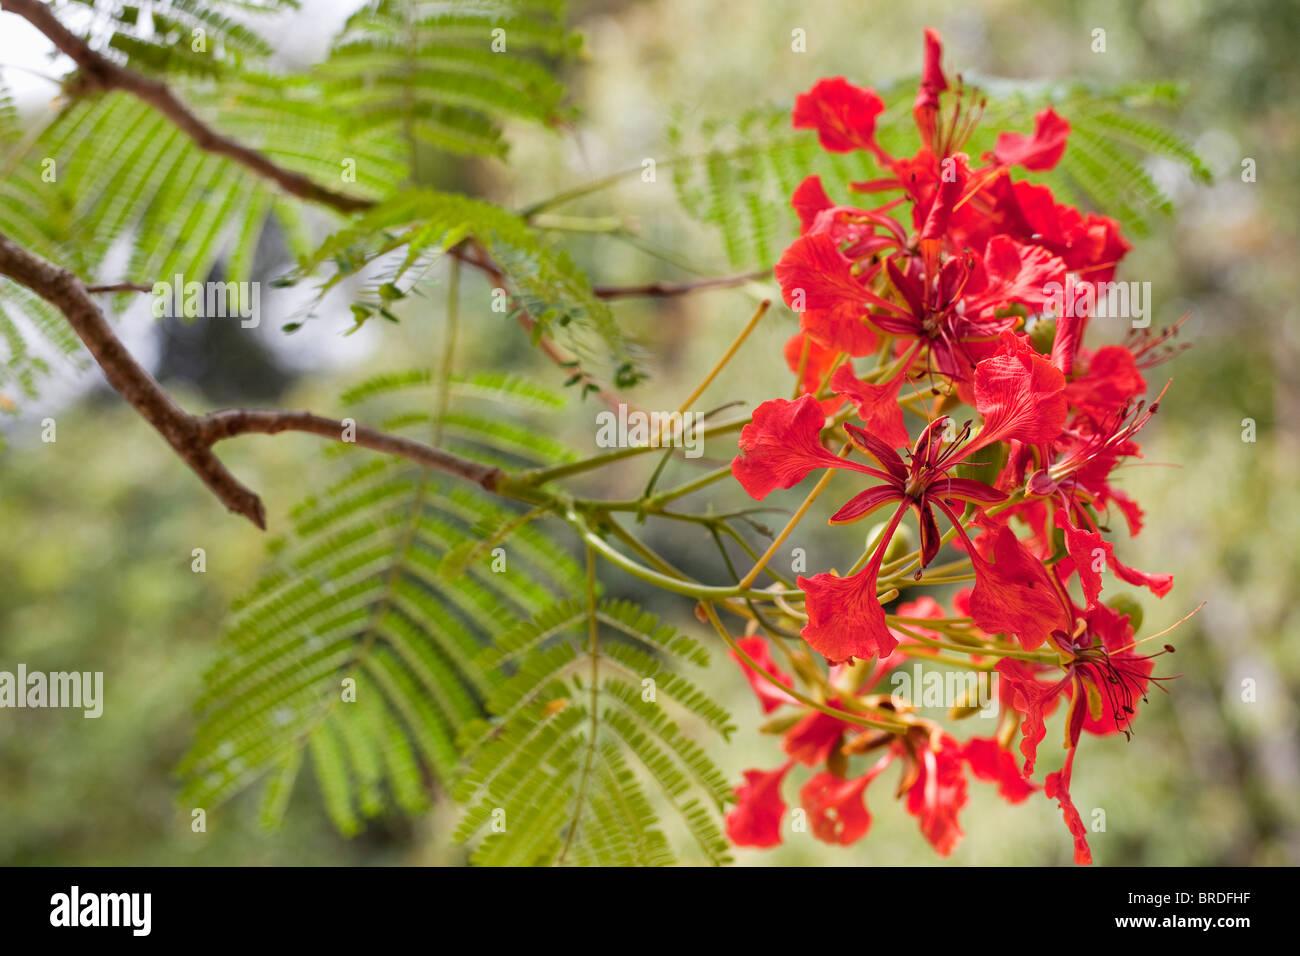 Poinciana stockfotos poinciana bilder alamy - Baum auf spanisch ...